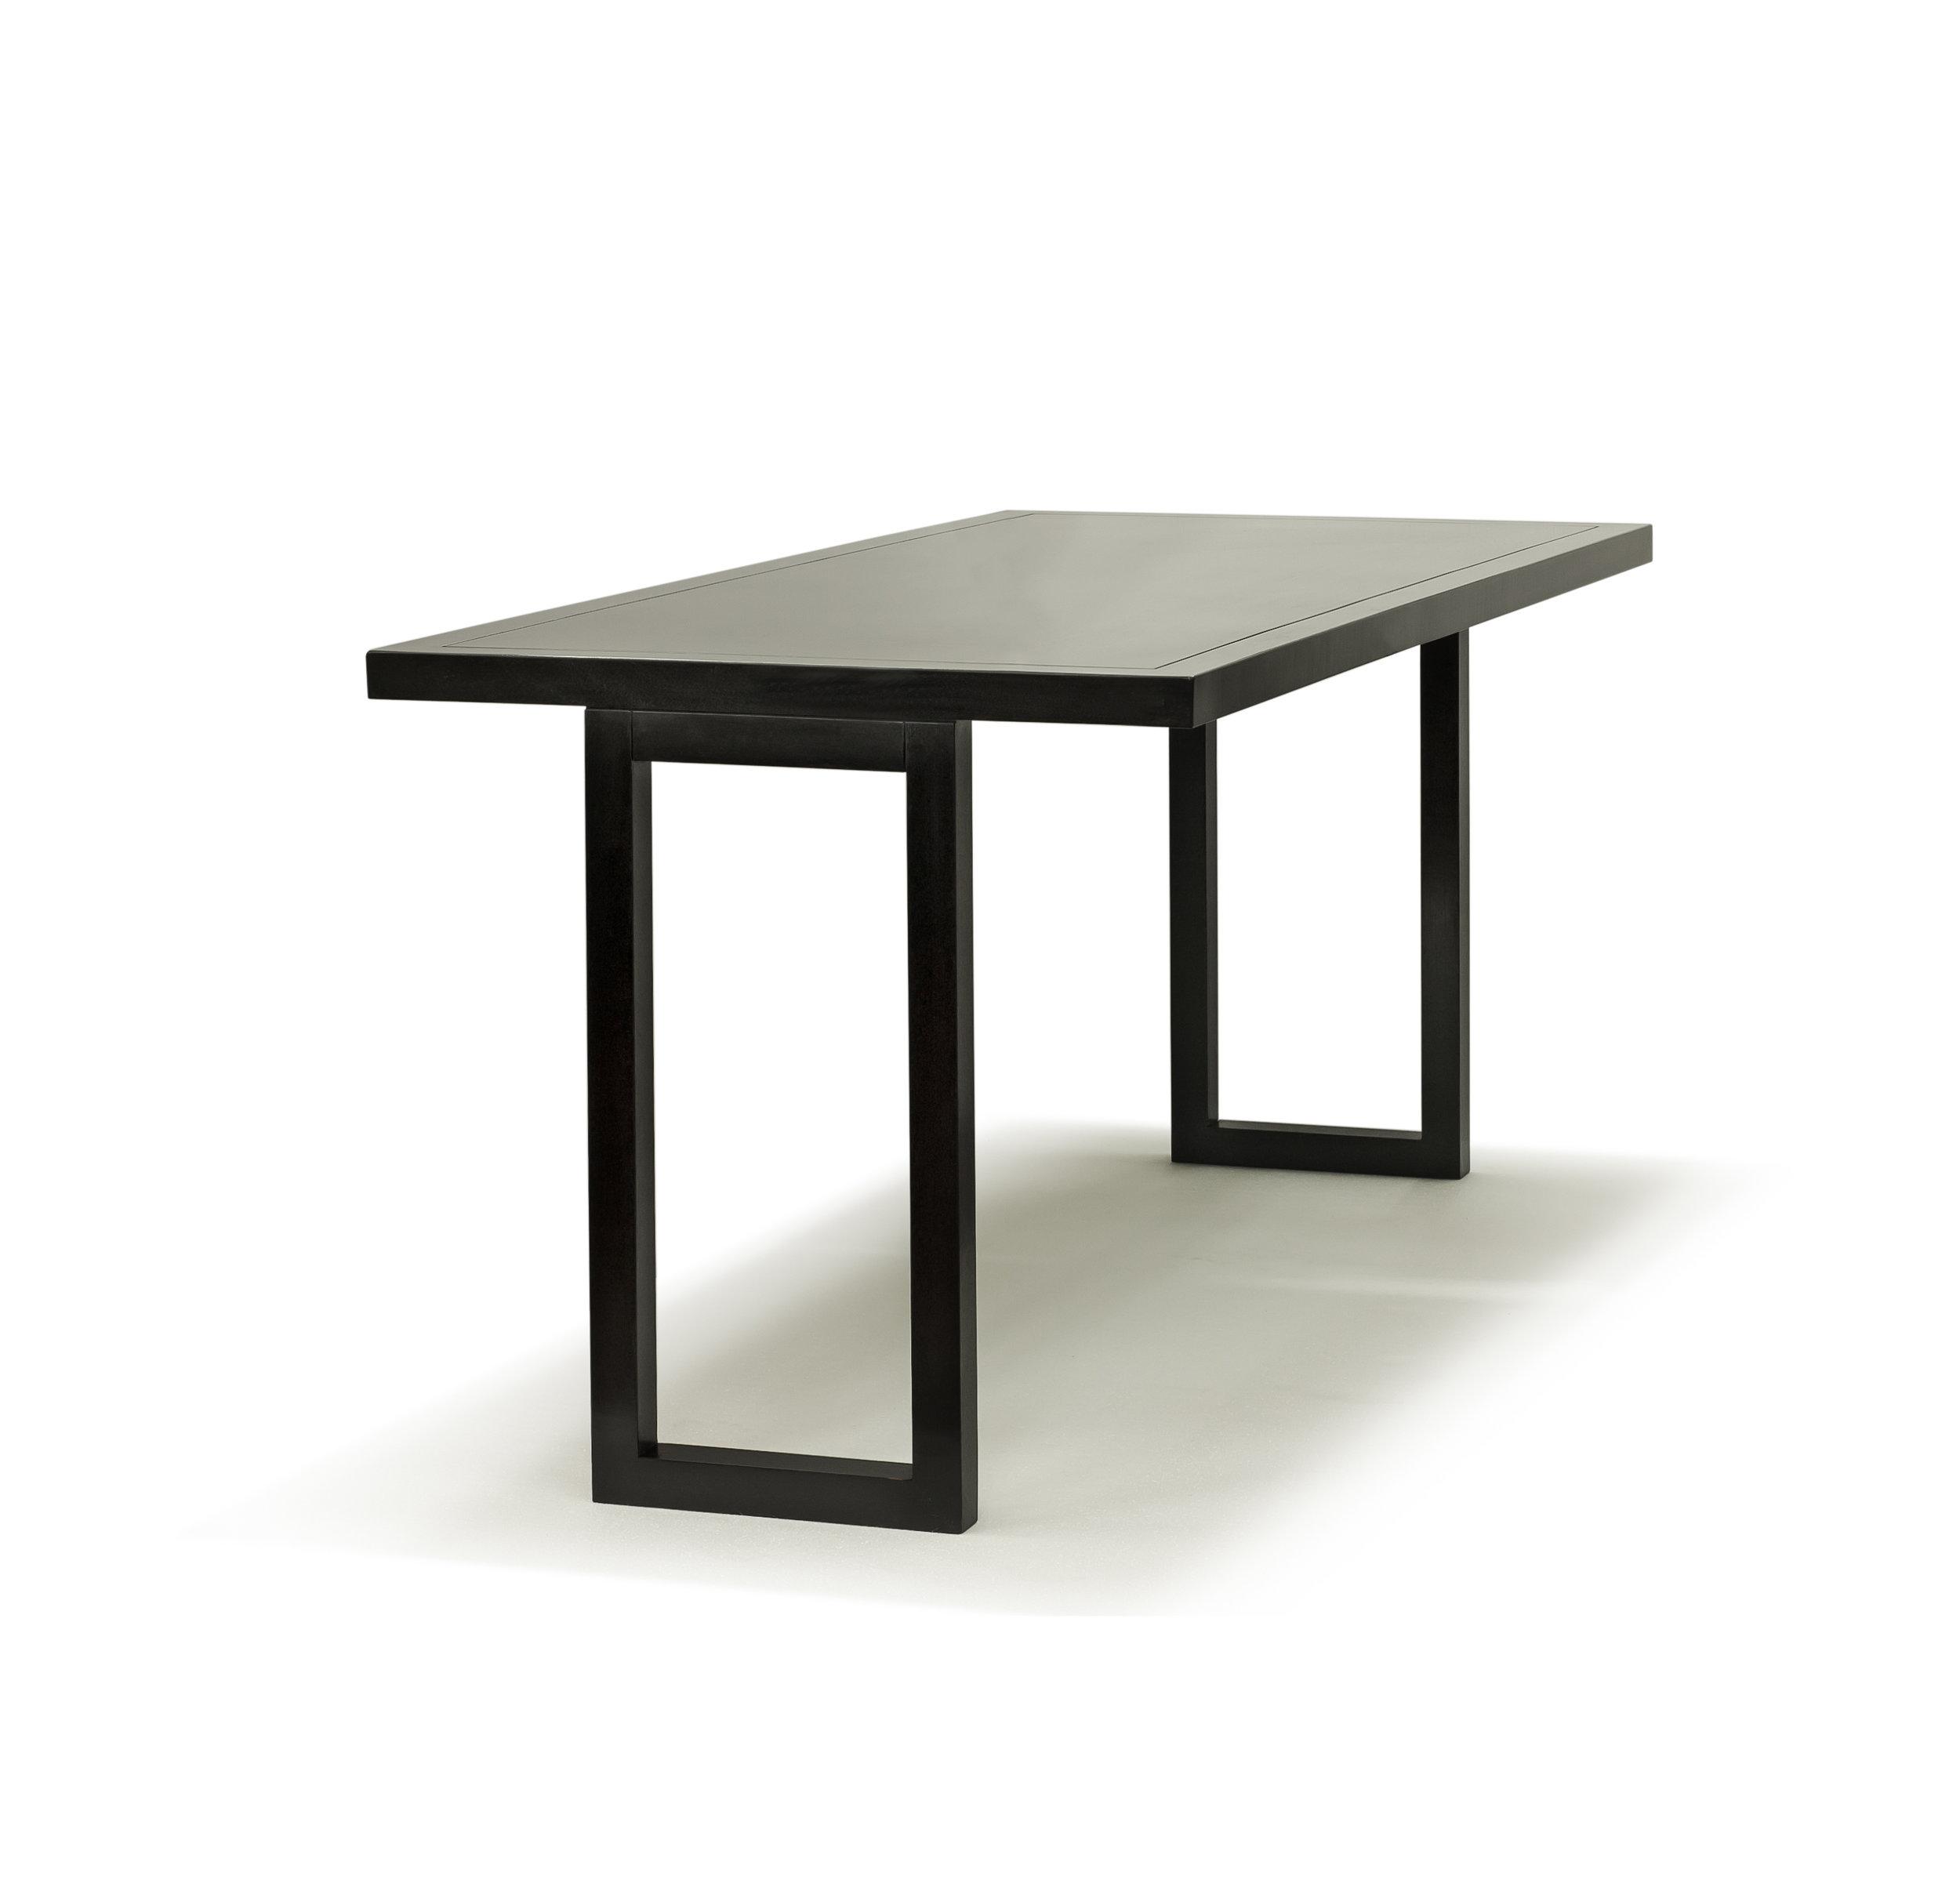 ....Bespoke Modern Chinese furniture : Dining Table..特别定制现代中式家具: 餐台....